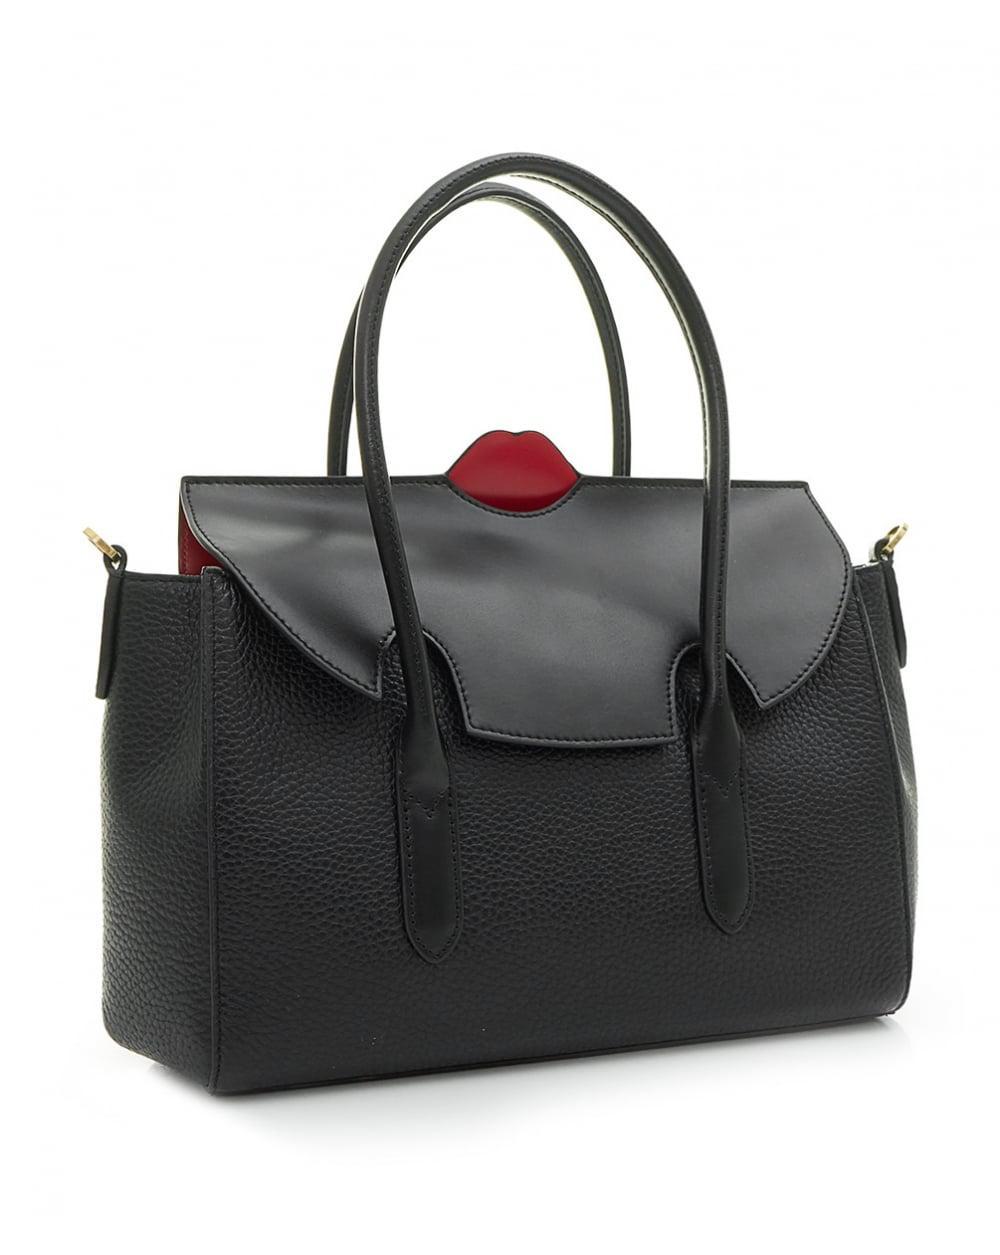 ae42c2d3b7ed Lyst - Lulu Guinness Pop Up Lip Flo Crossbody Bag in Black